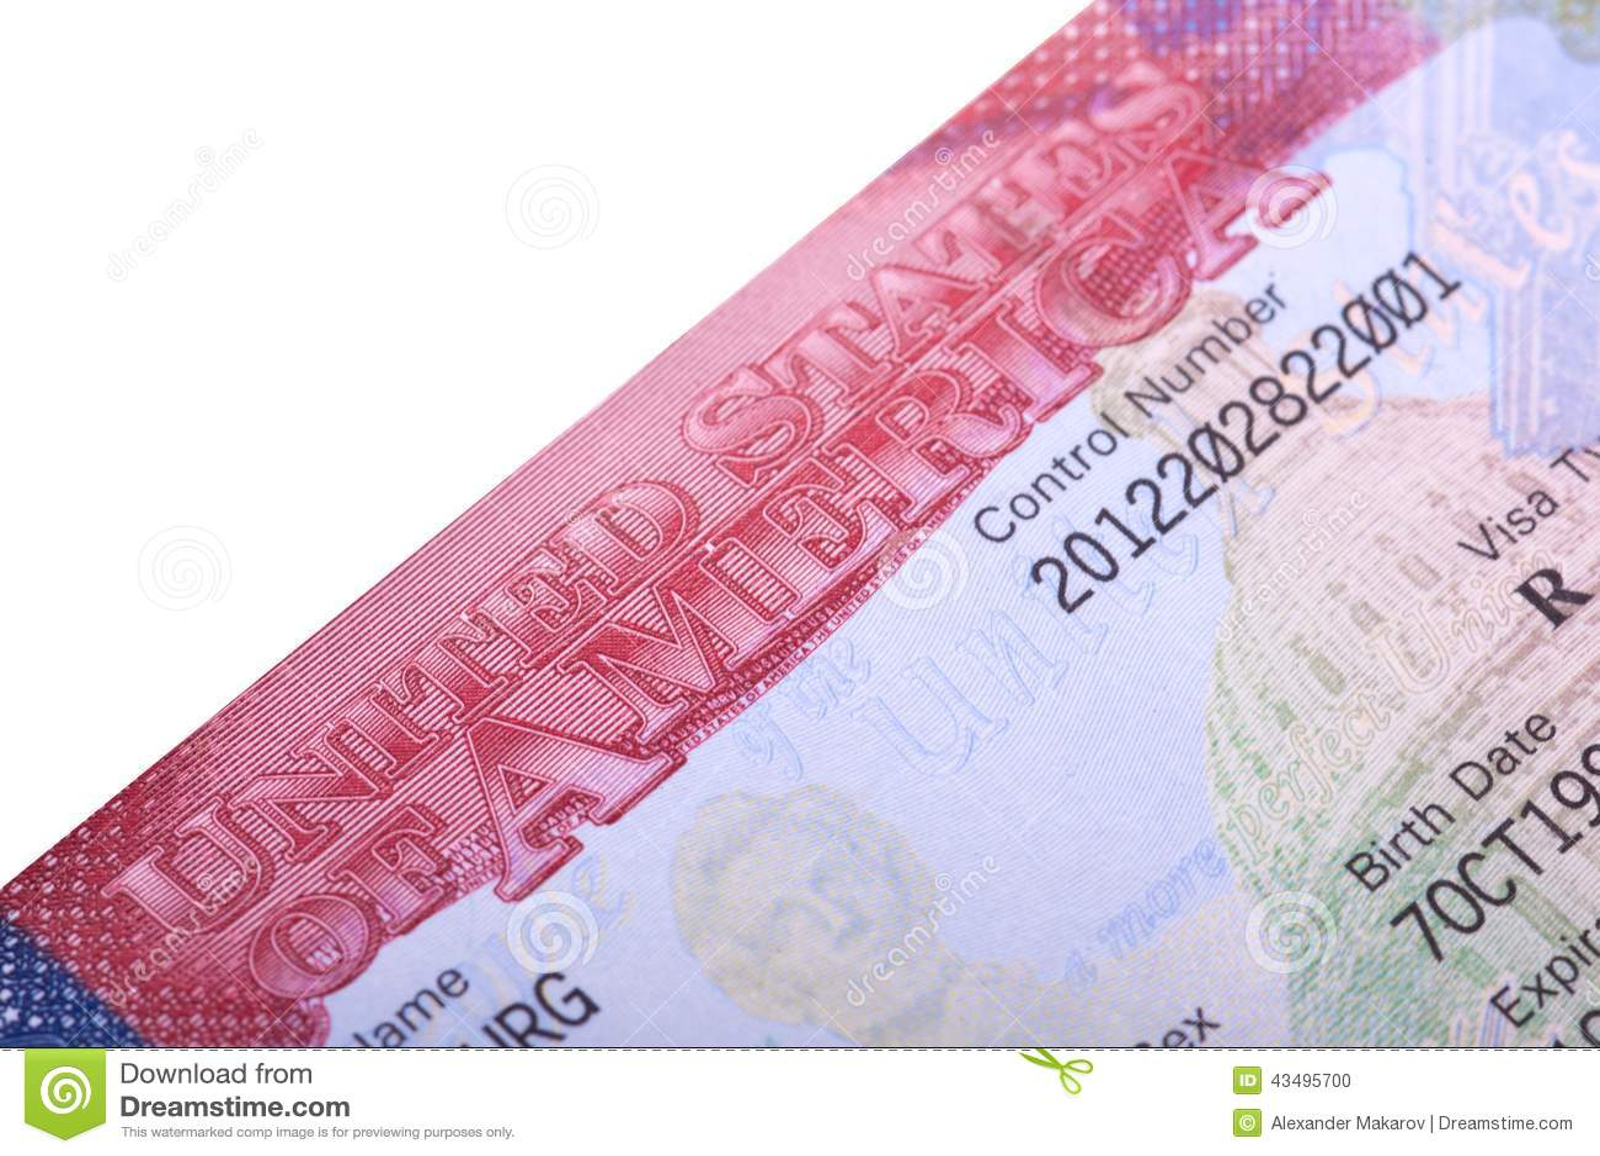 American Visa In The Passport  Stock Photo - Image of blue